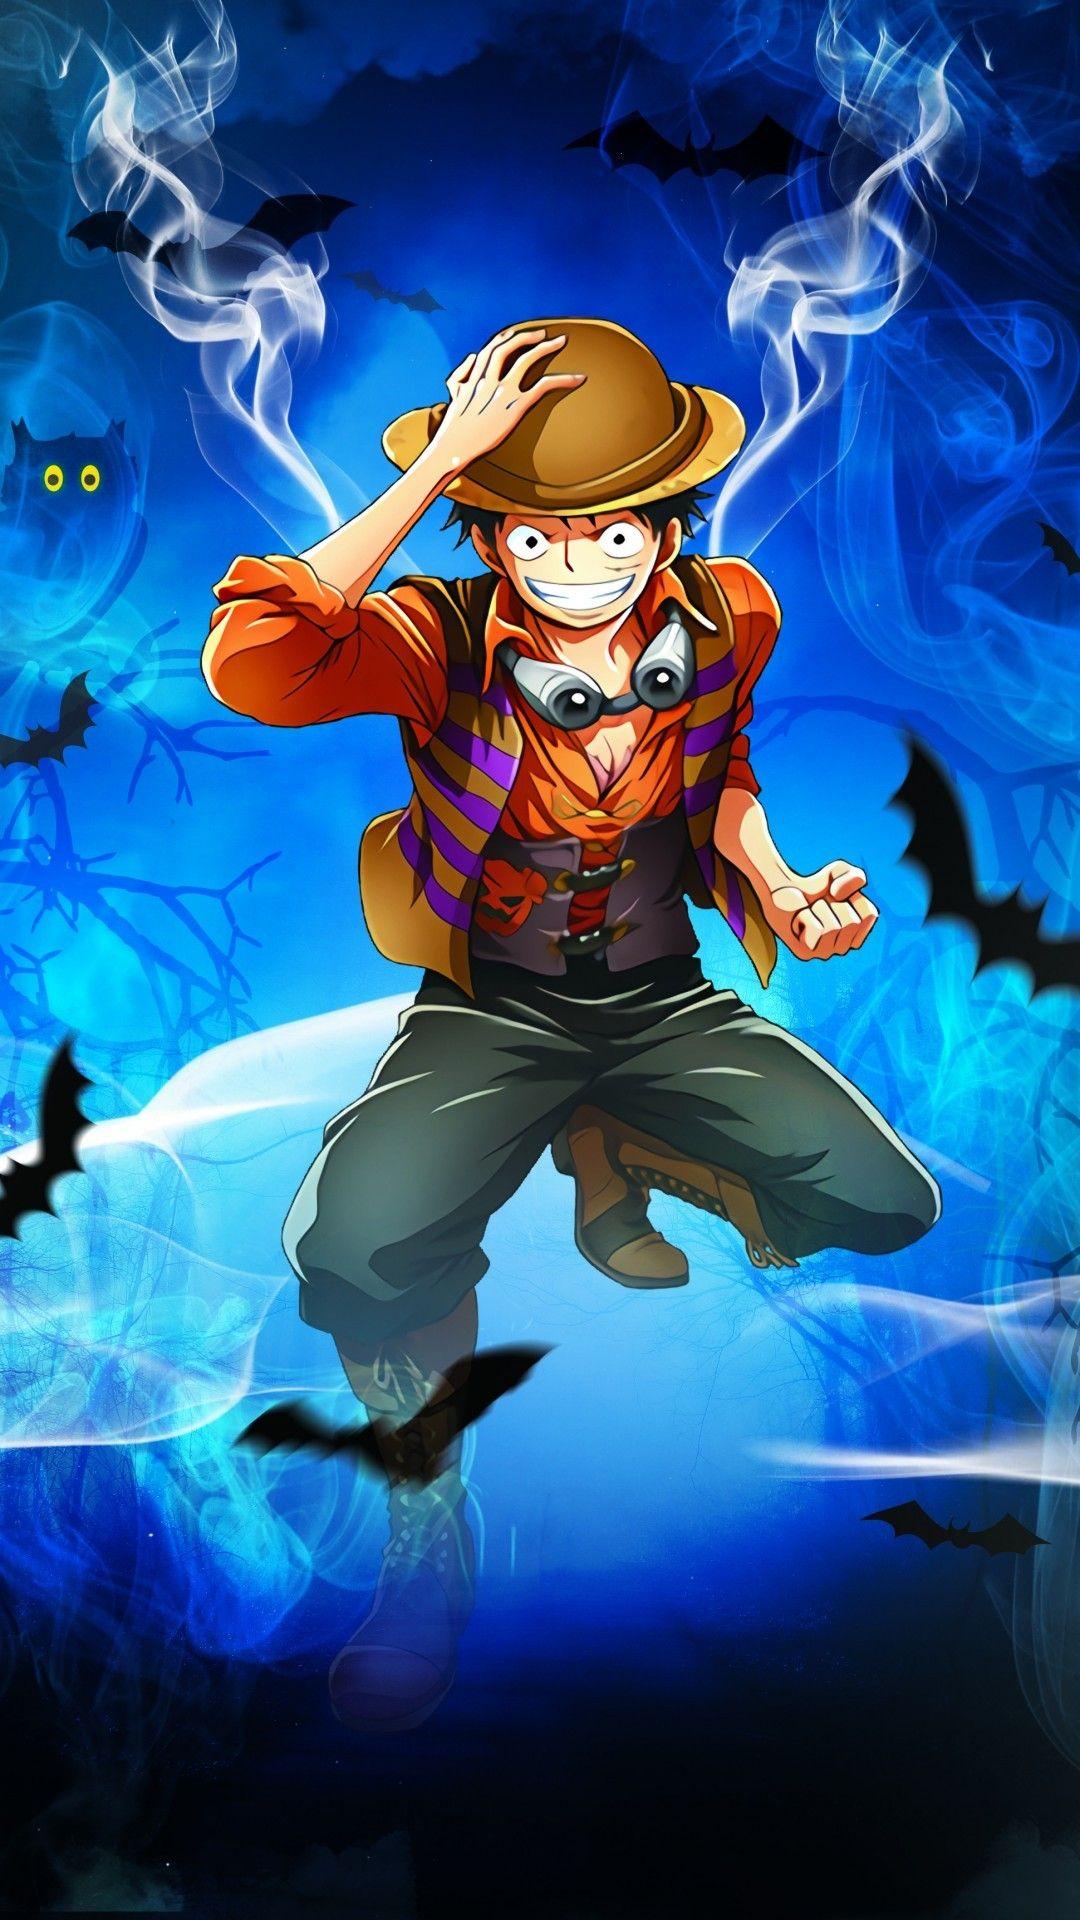 Download 1080x1920 Monkey D. Luffy, Straw Hat Pirates, One